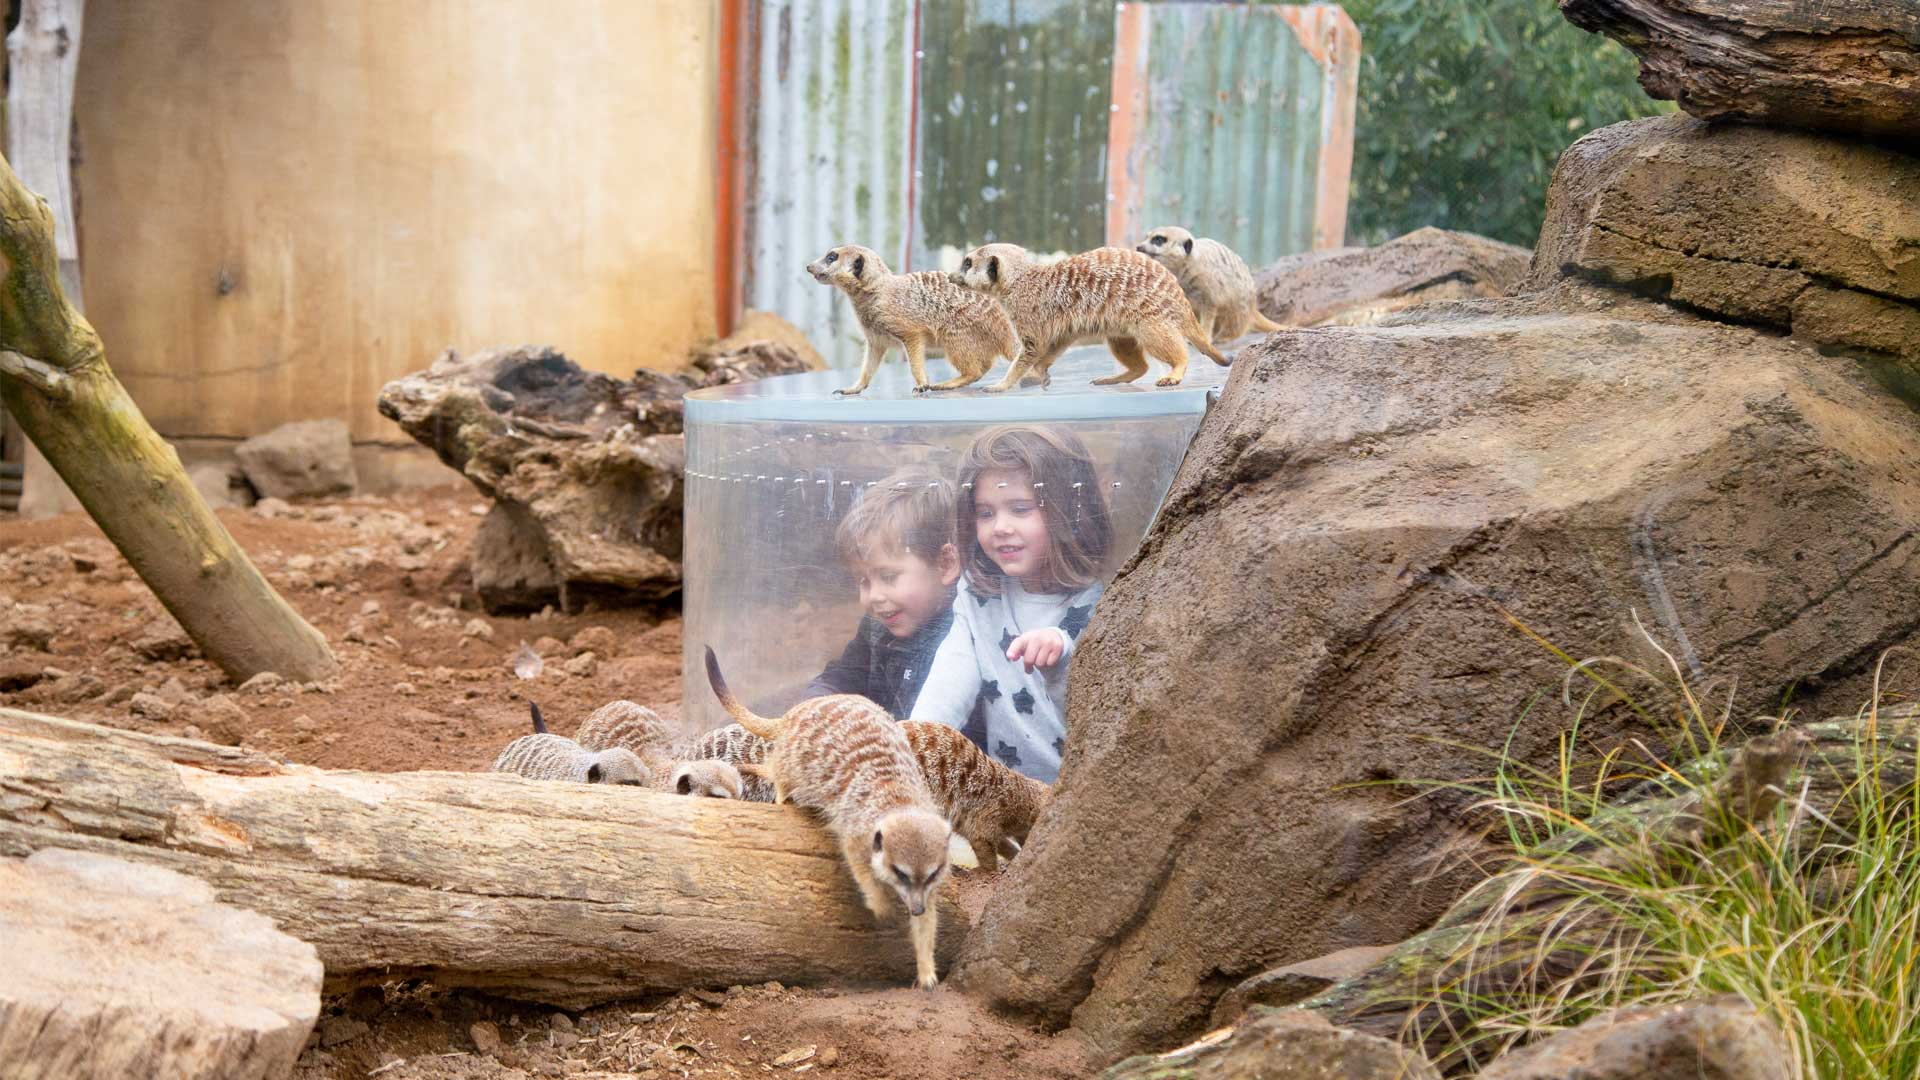 https://rfacdn.nz/zoo/assets/media/kids-meerkats-gallery-1.jpg